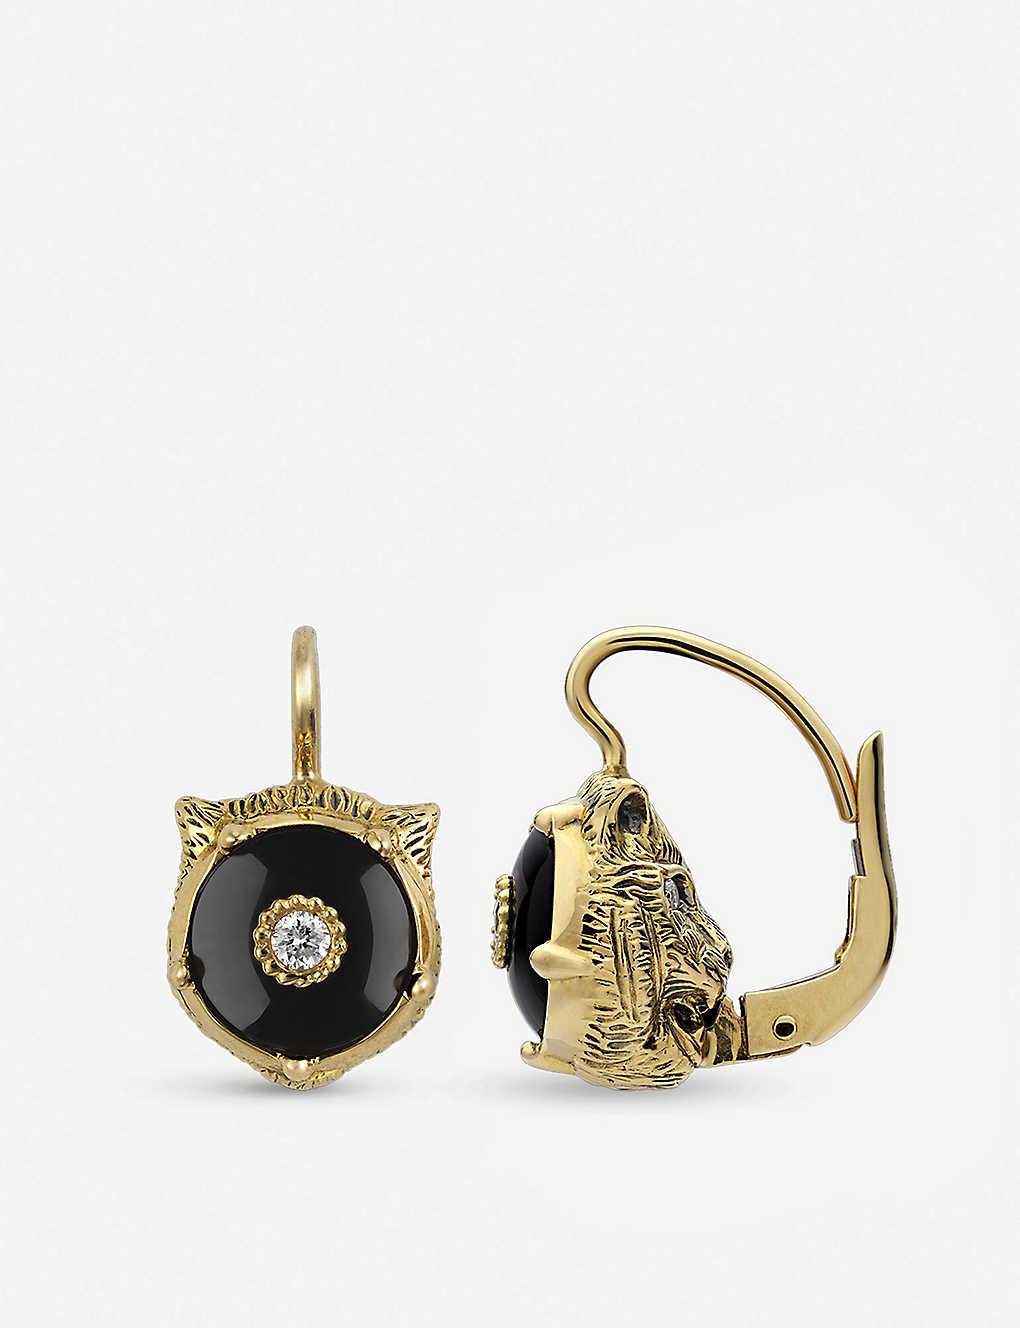 16f87d193e0227 Le Marché des Merveilles 18ct yellow-gold, black onyx and diamond earrings  - Yellow ...